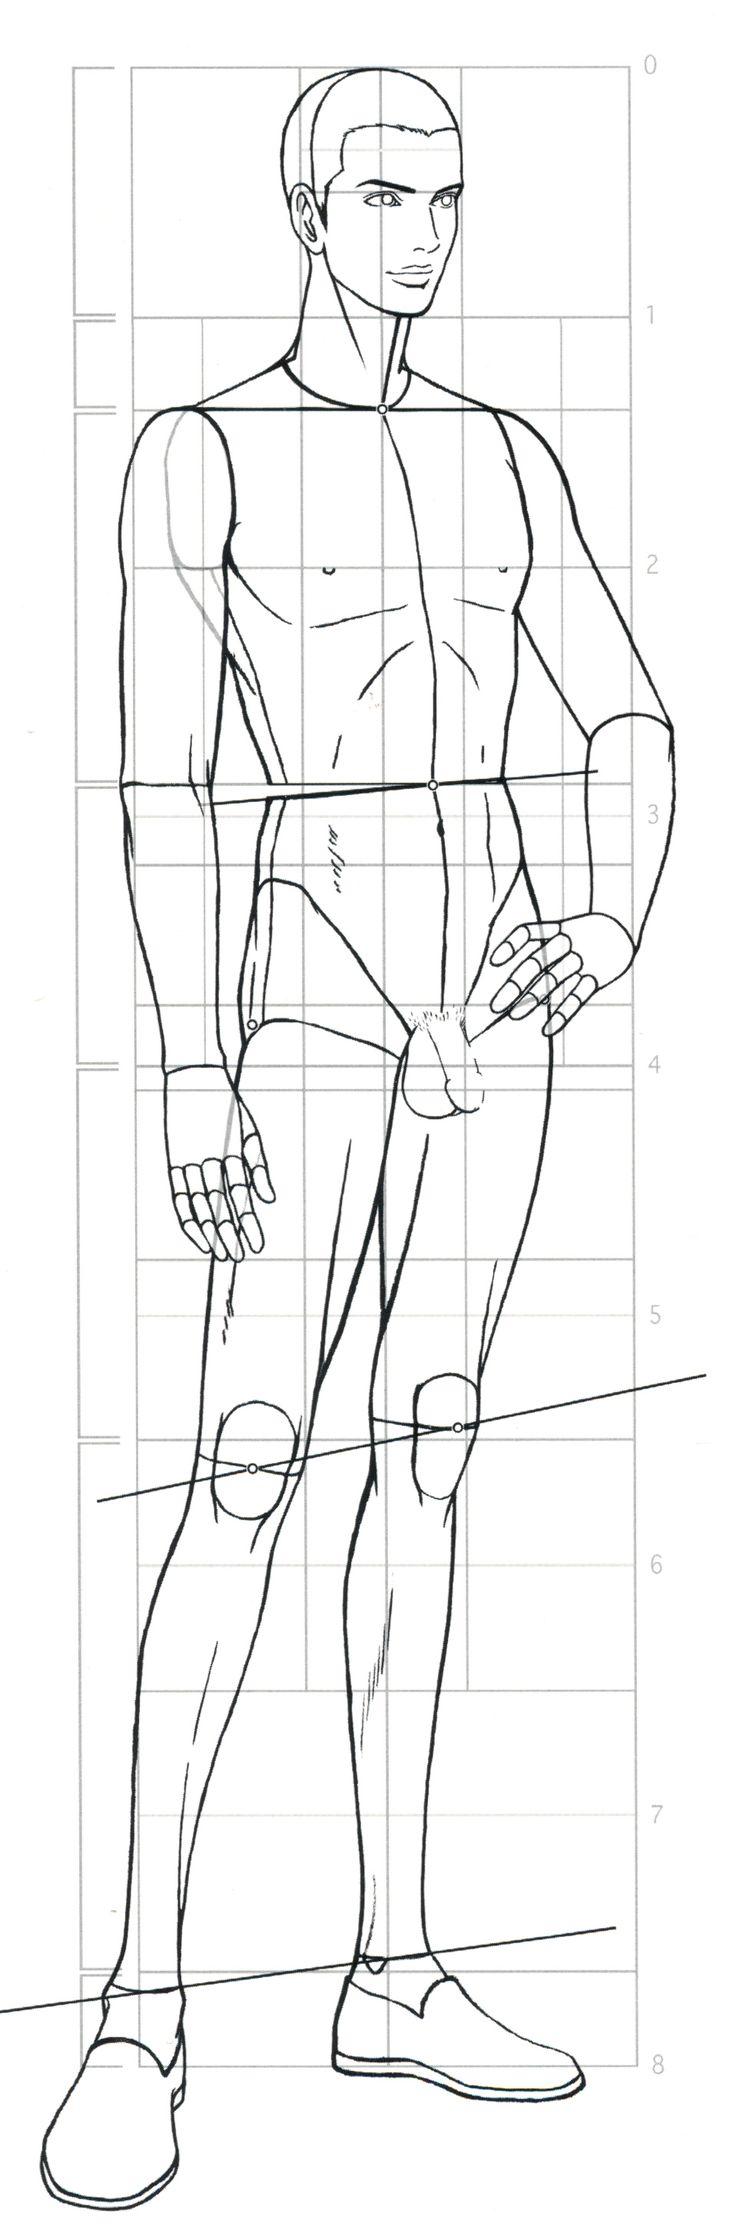 Mejores 134 imágenes de Fashion templates / croquis / figurines en ...